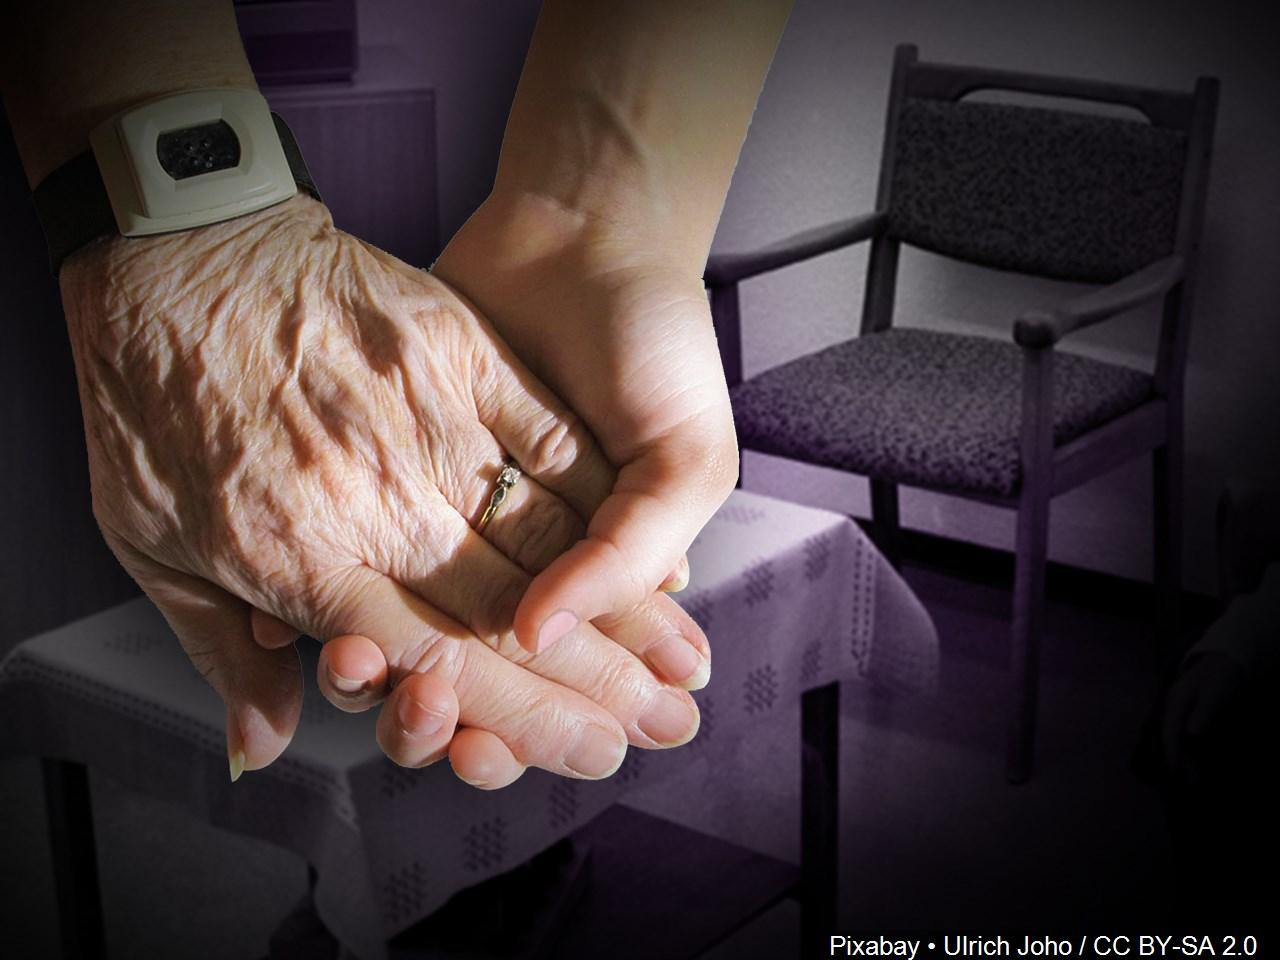 nursing home_1524698952910.jpg.jpg